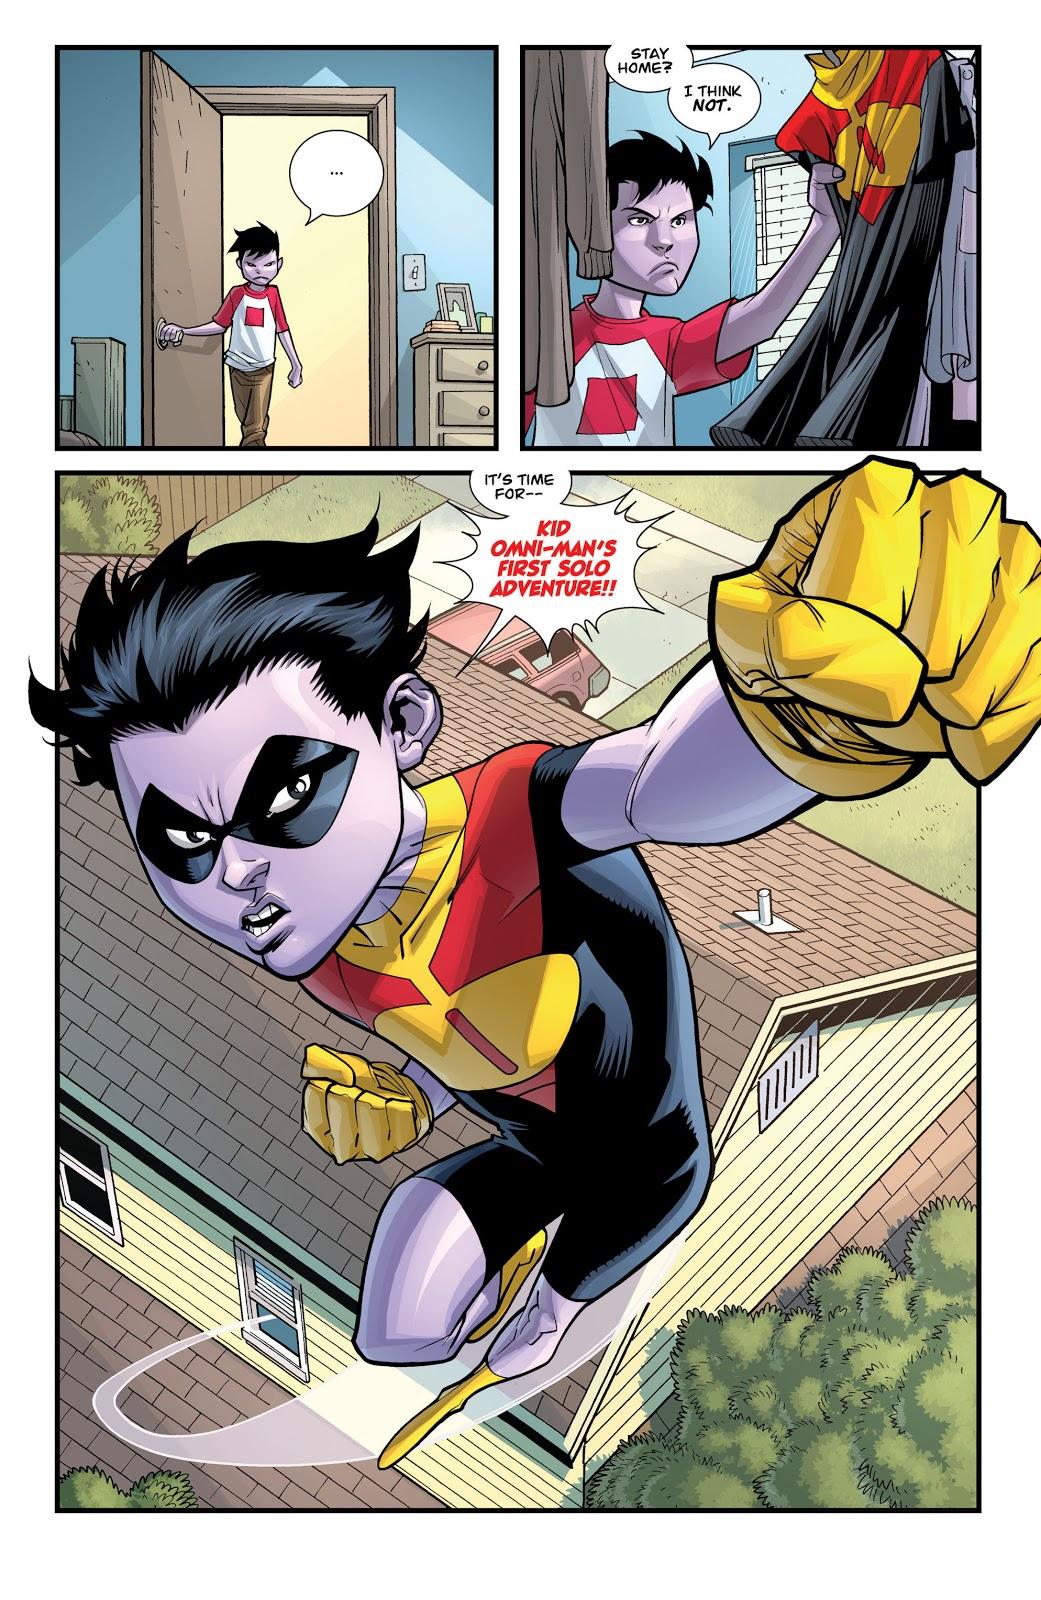 Kid Omni-Man (Invincible #56)